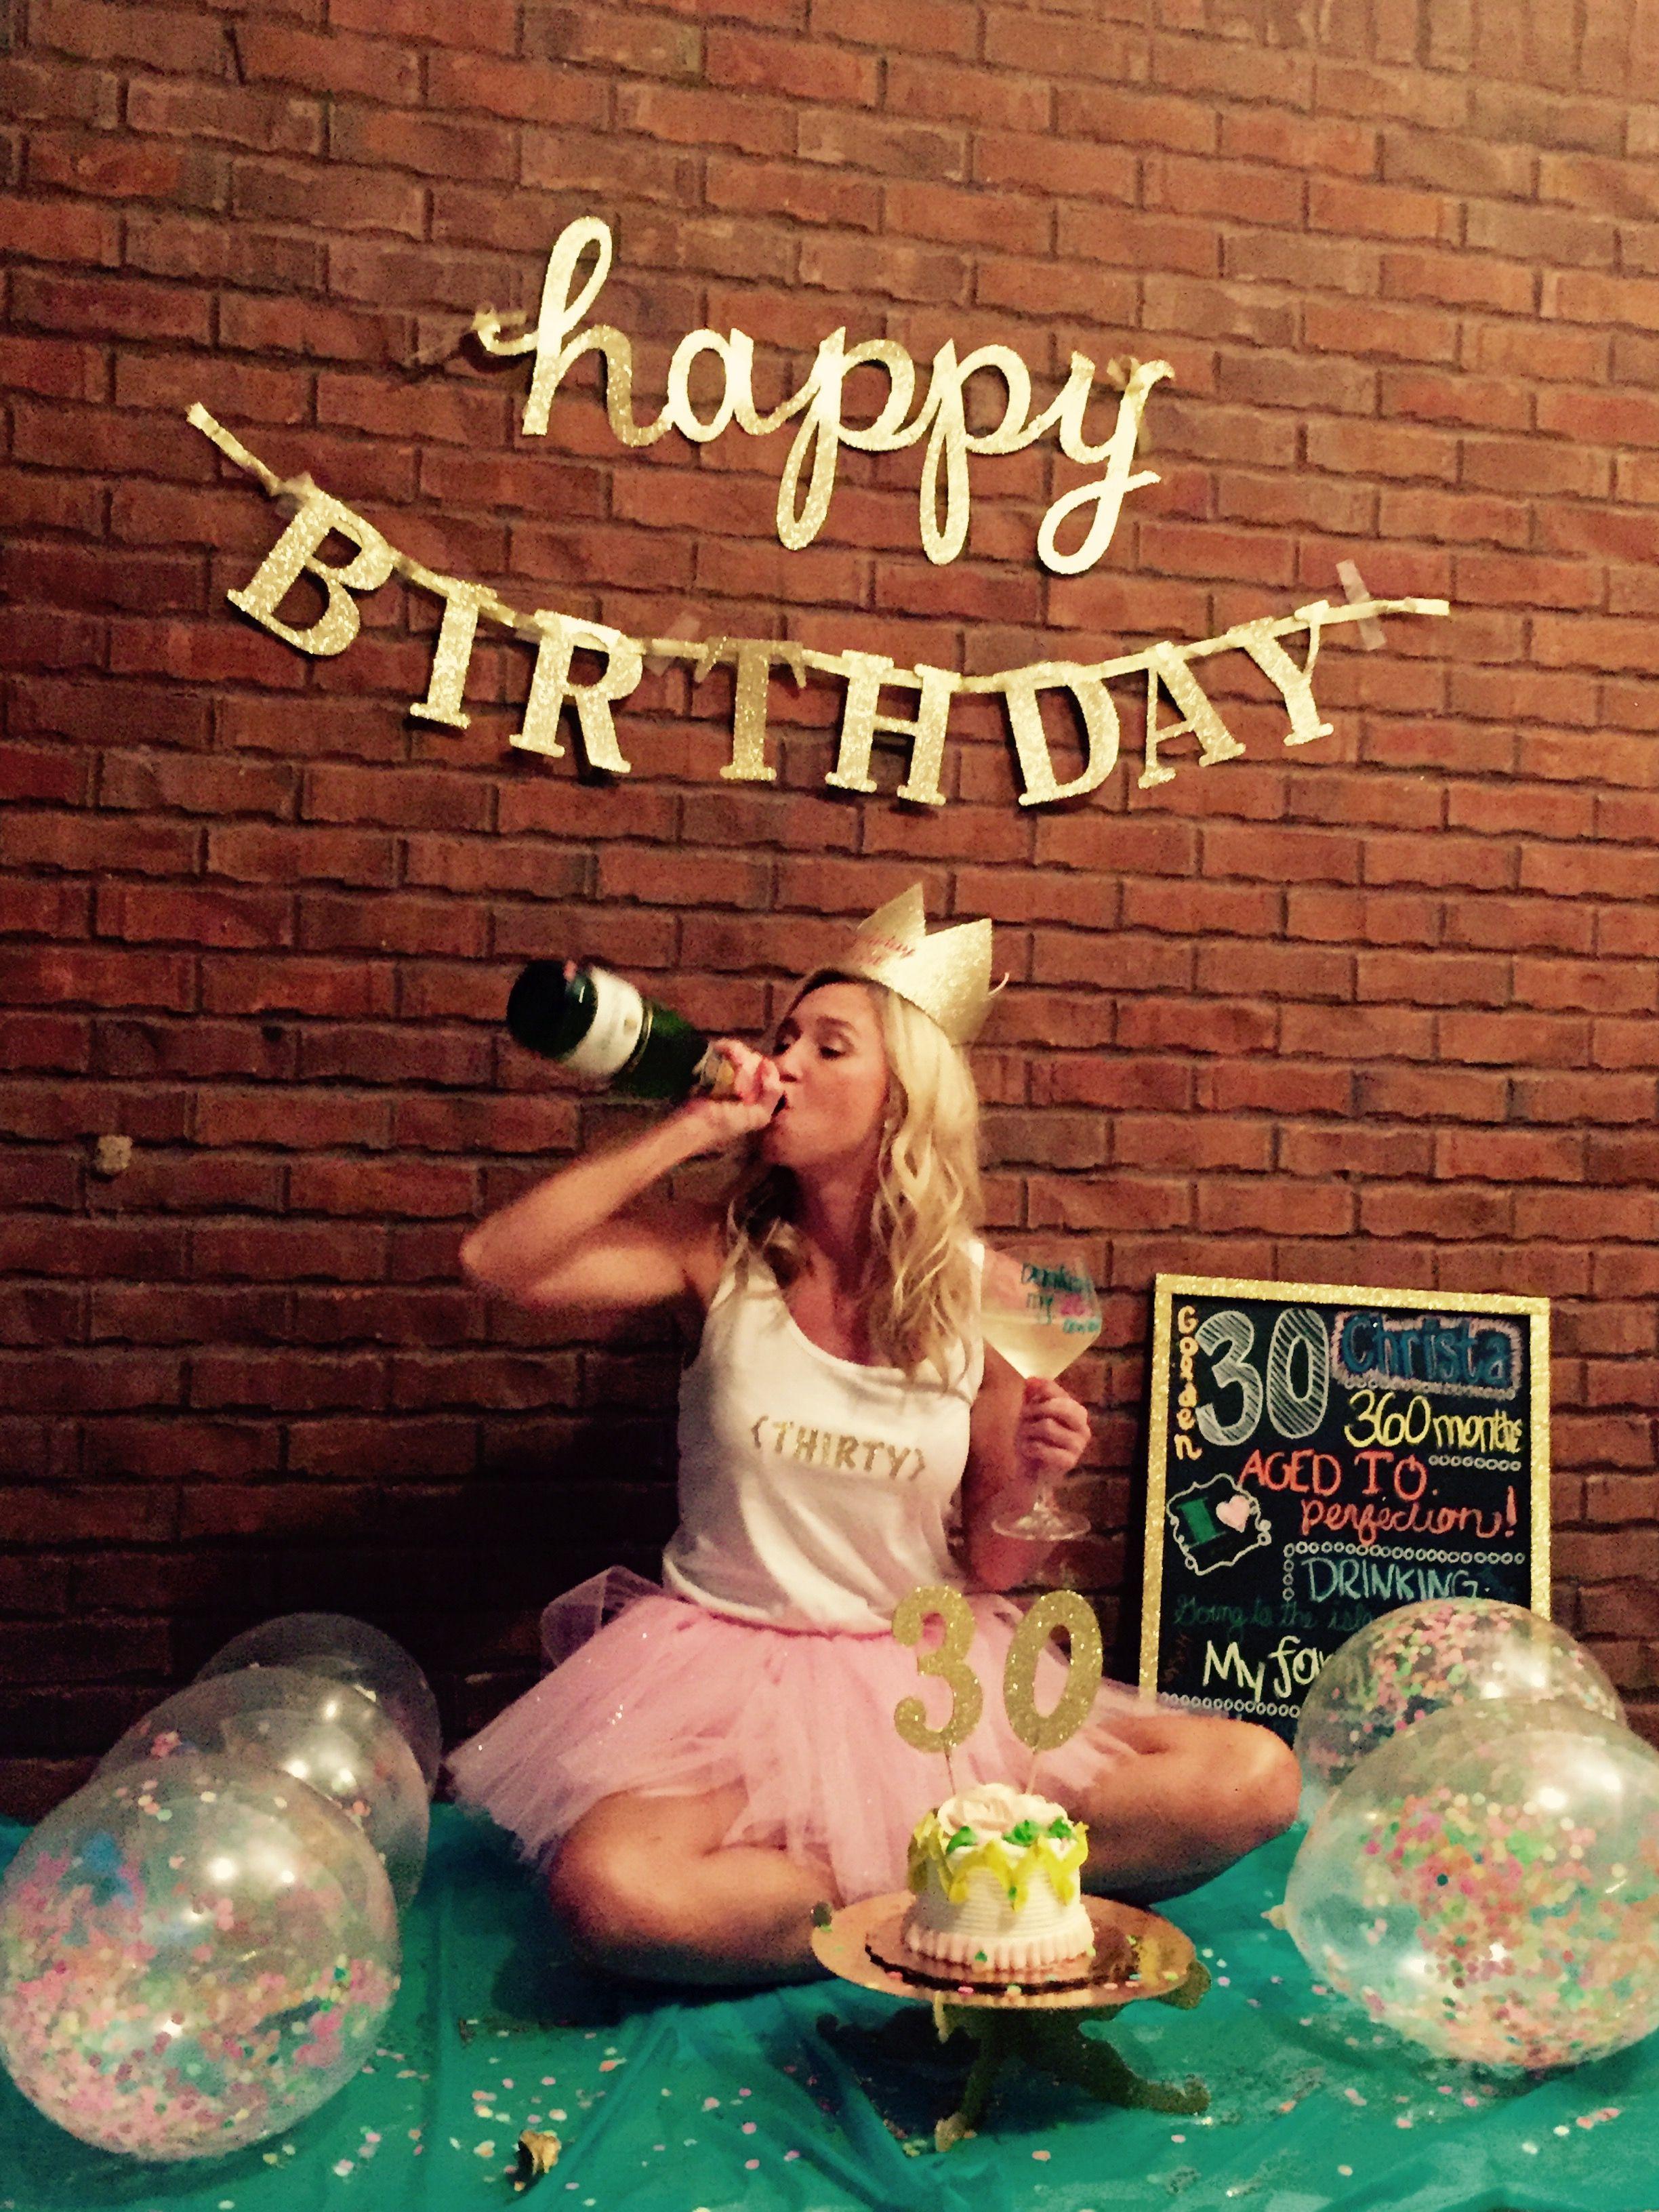 30Th Birthday Smash Cake And Booze Photo Shoot Drinking -2461